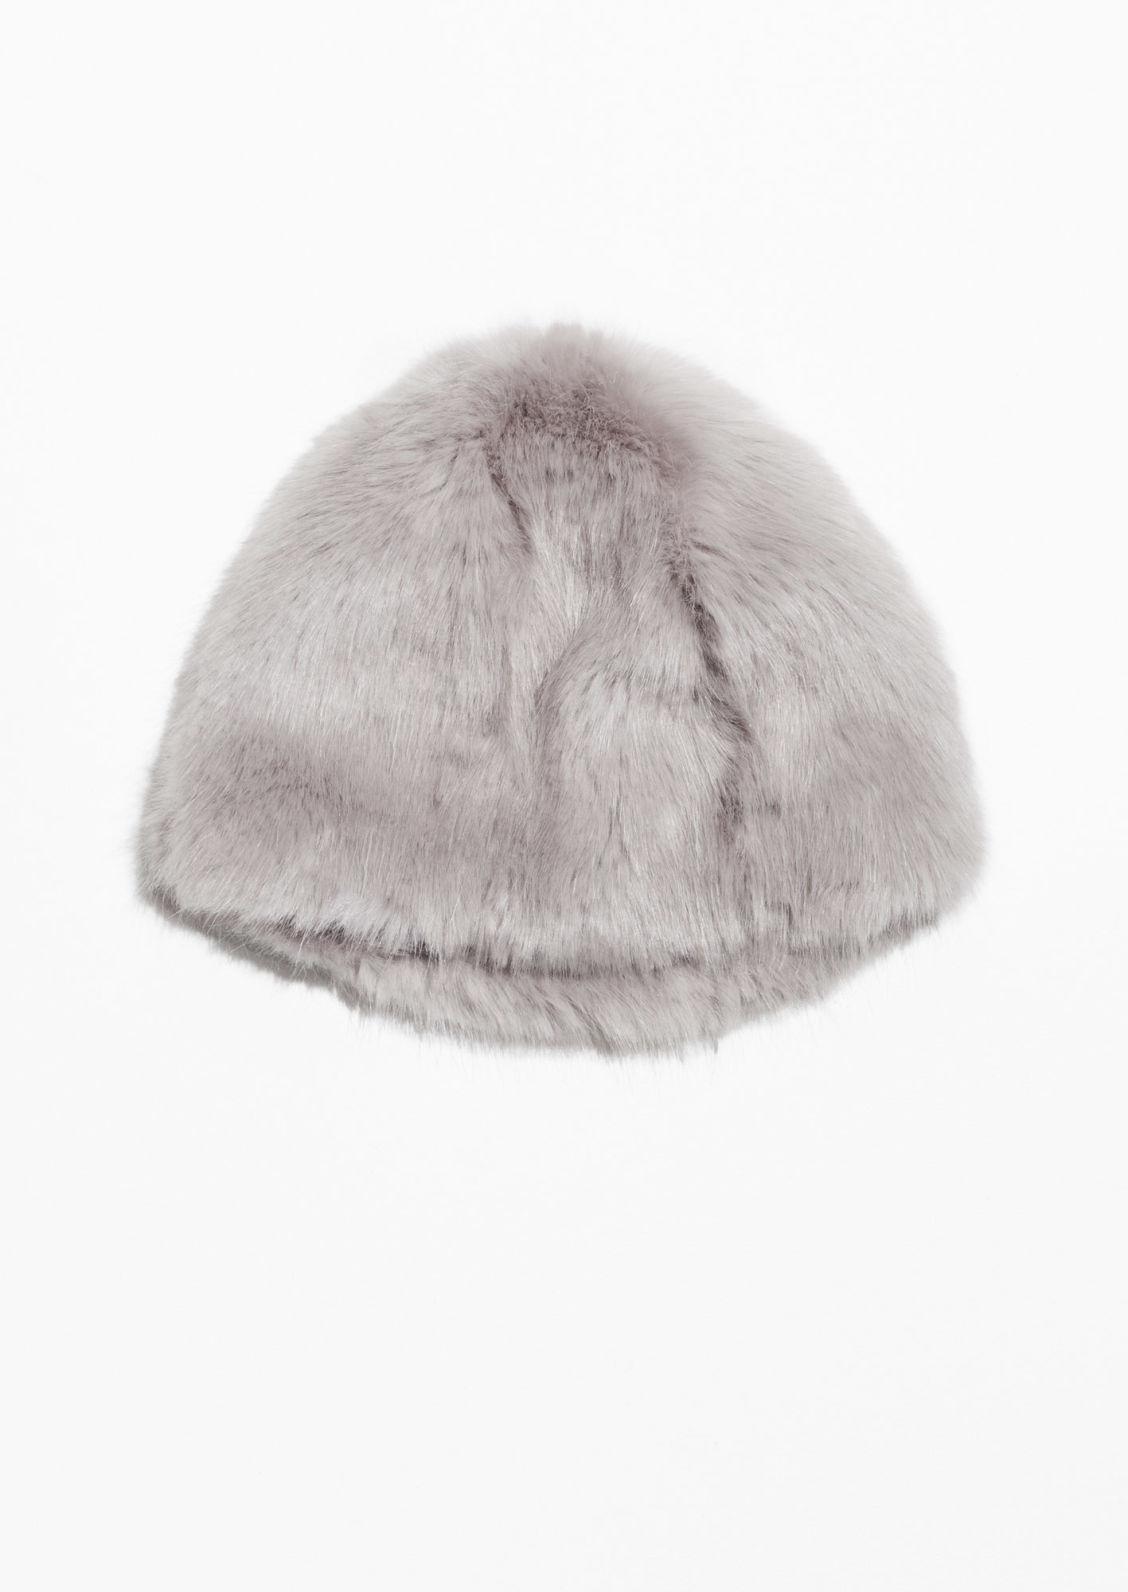 91c0d7c5725 Faux Fur Hat - Grey - Female First Shopping